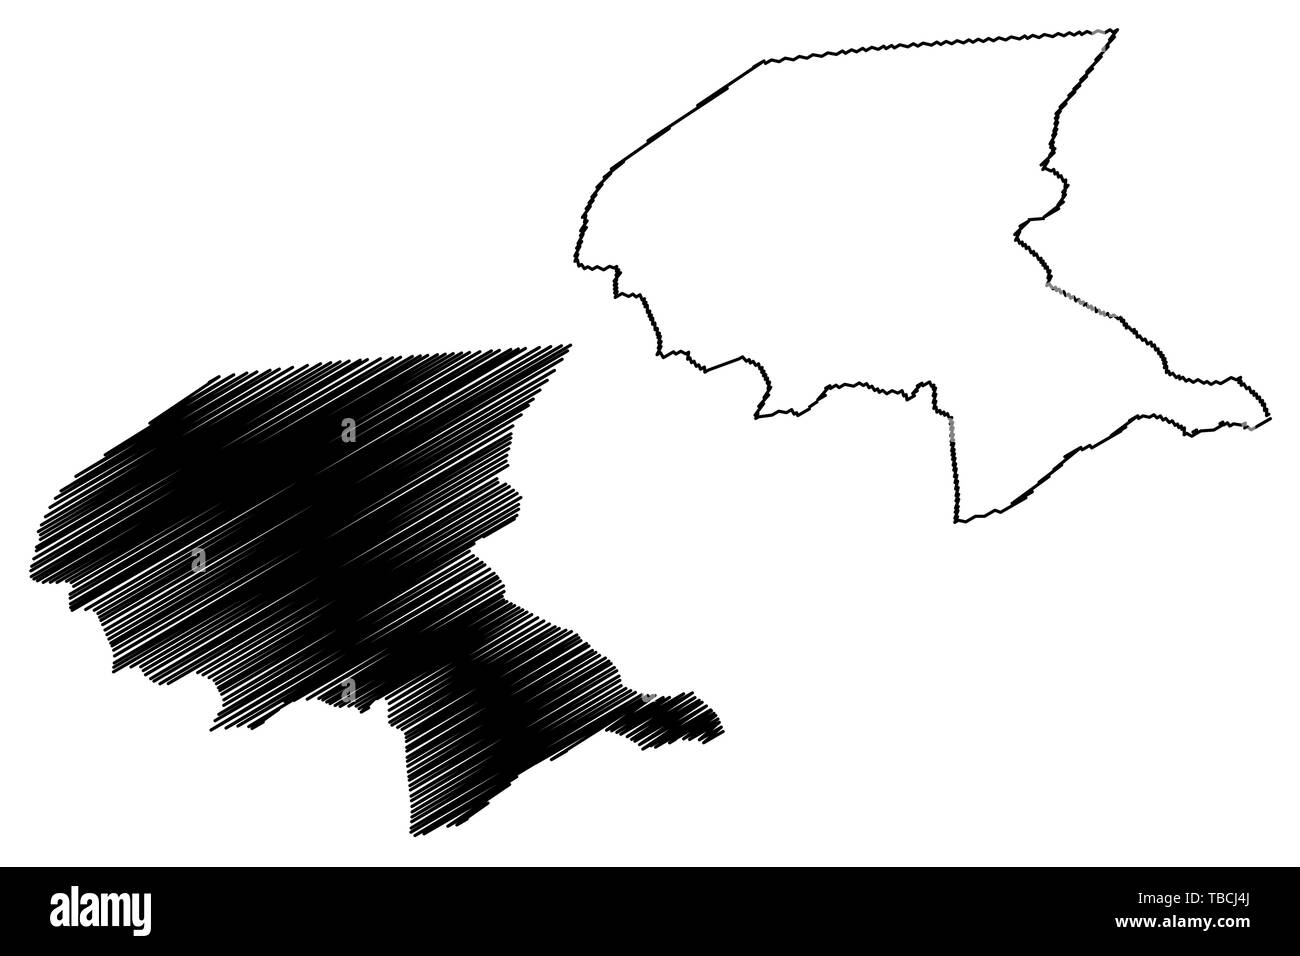 Shabwah Governorate (Governorates of Yemen, Republic of Yemen) map vector illustration, scribble sketch Shabwah map - Stock Vector